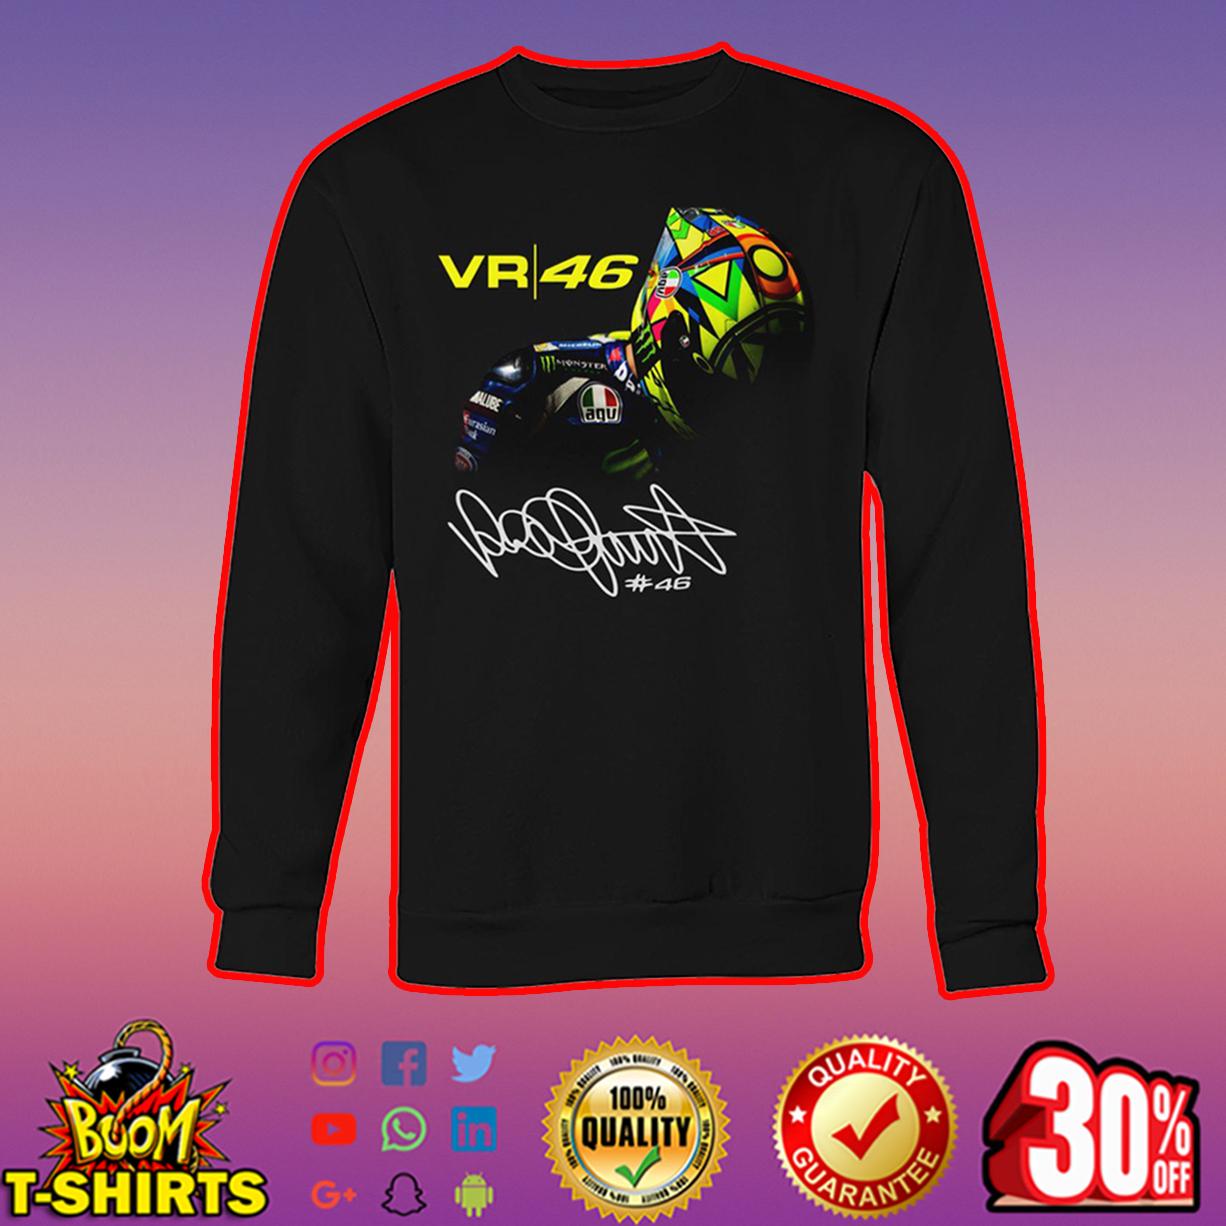 Valentino Rossi VR46 signature sweatshirt